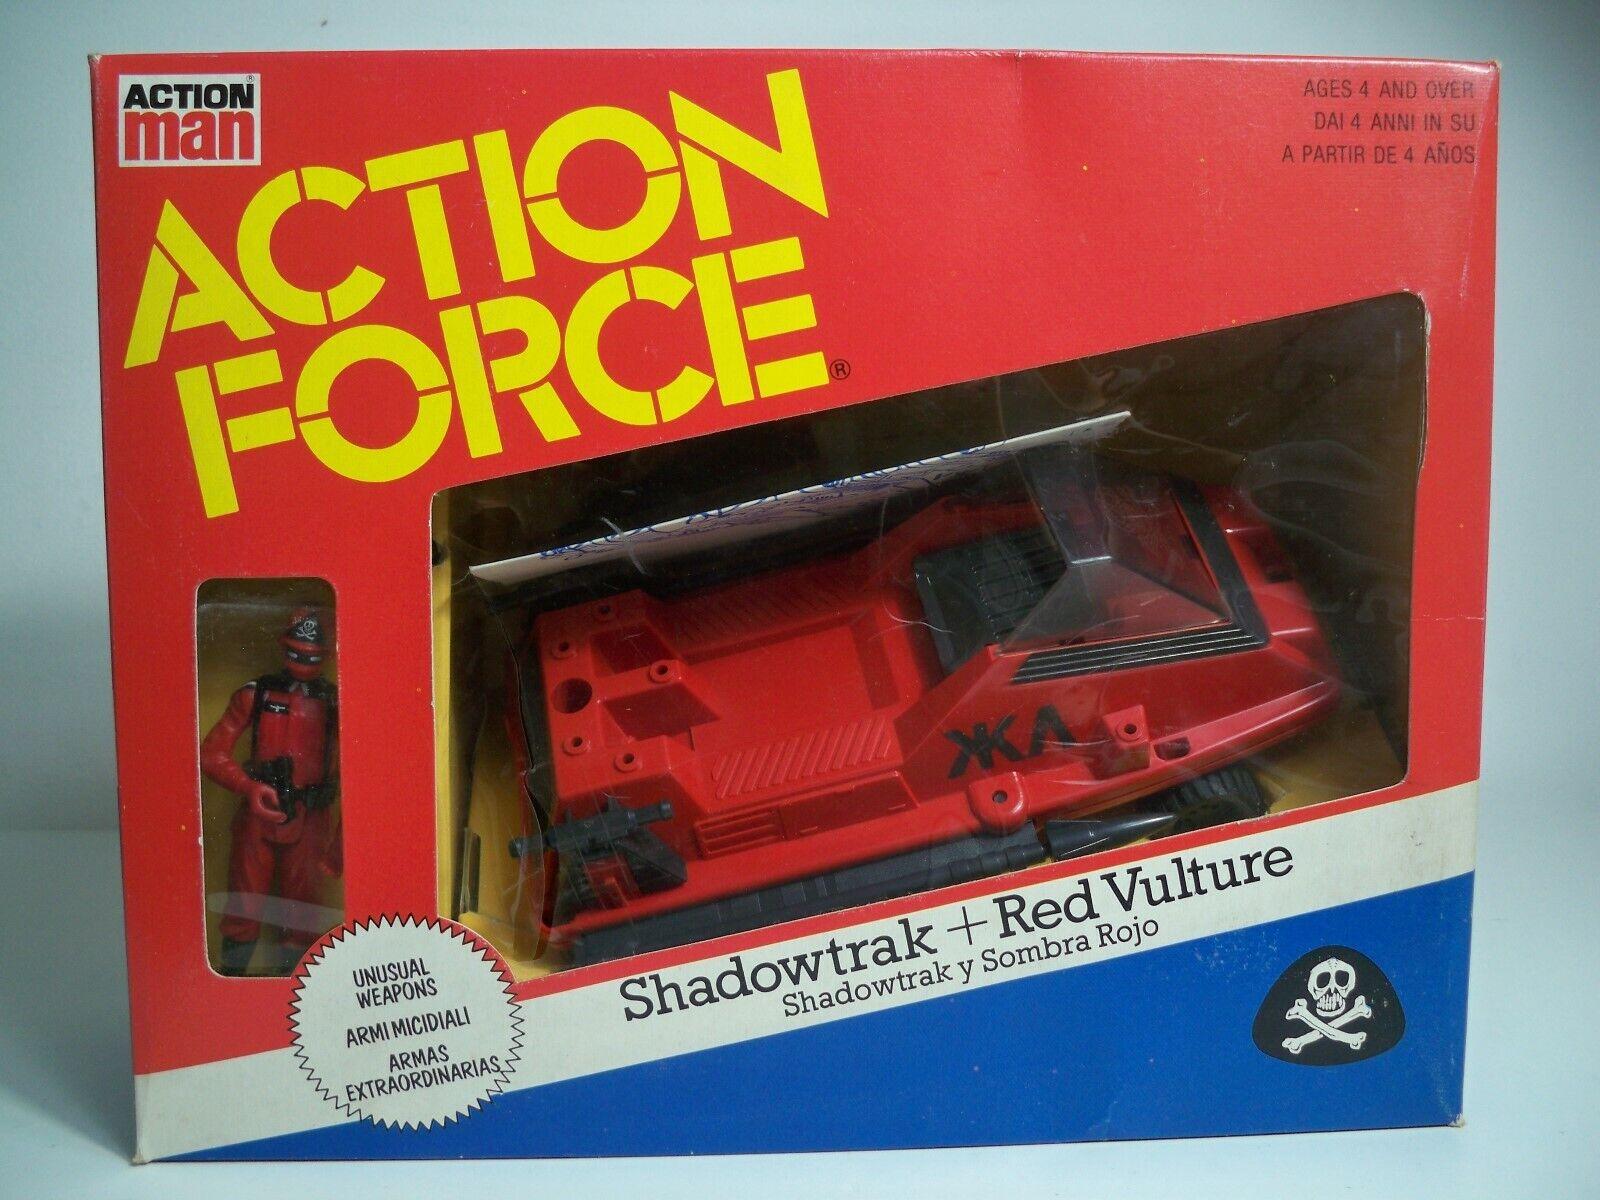 K1994151 SHADOW TRAK röd VUXURE W BOX KOMPLETTERANDE ÅTGÄRDER FRÅN UK FORCE MAN GI JOE